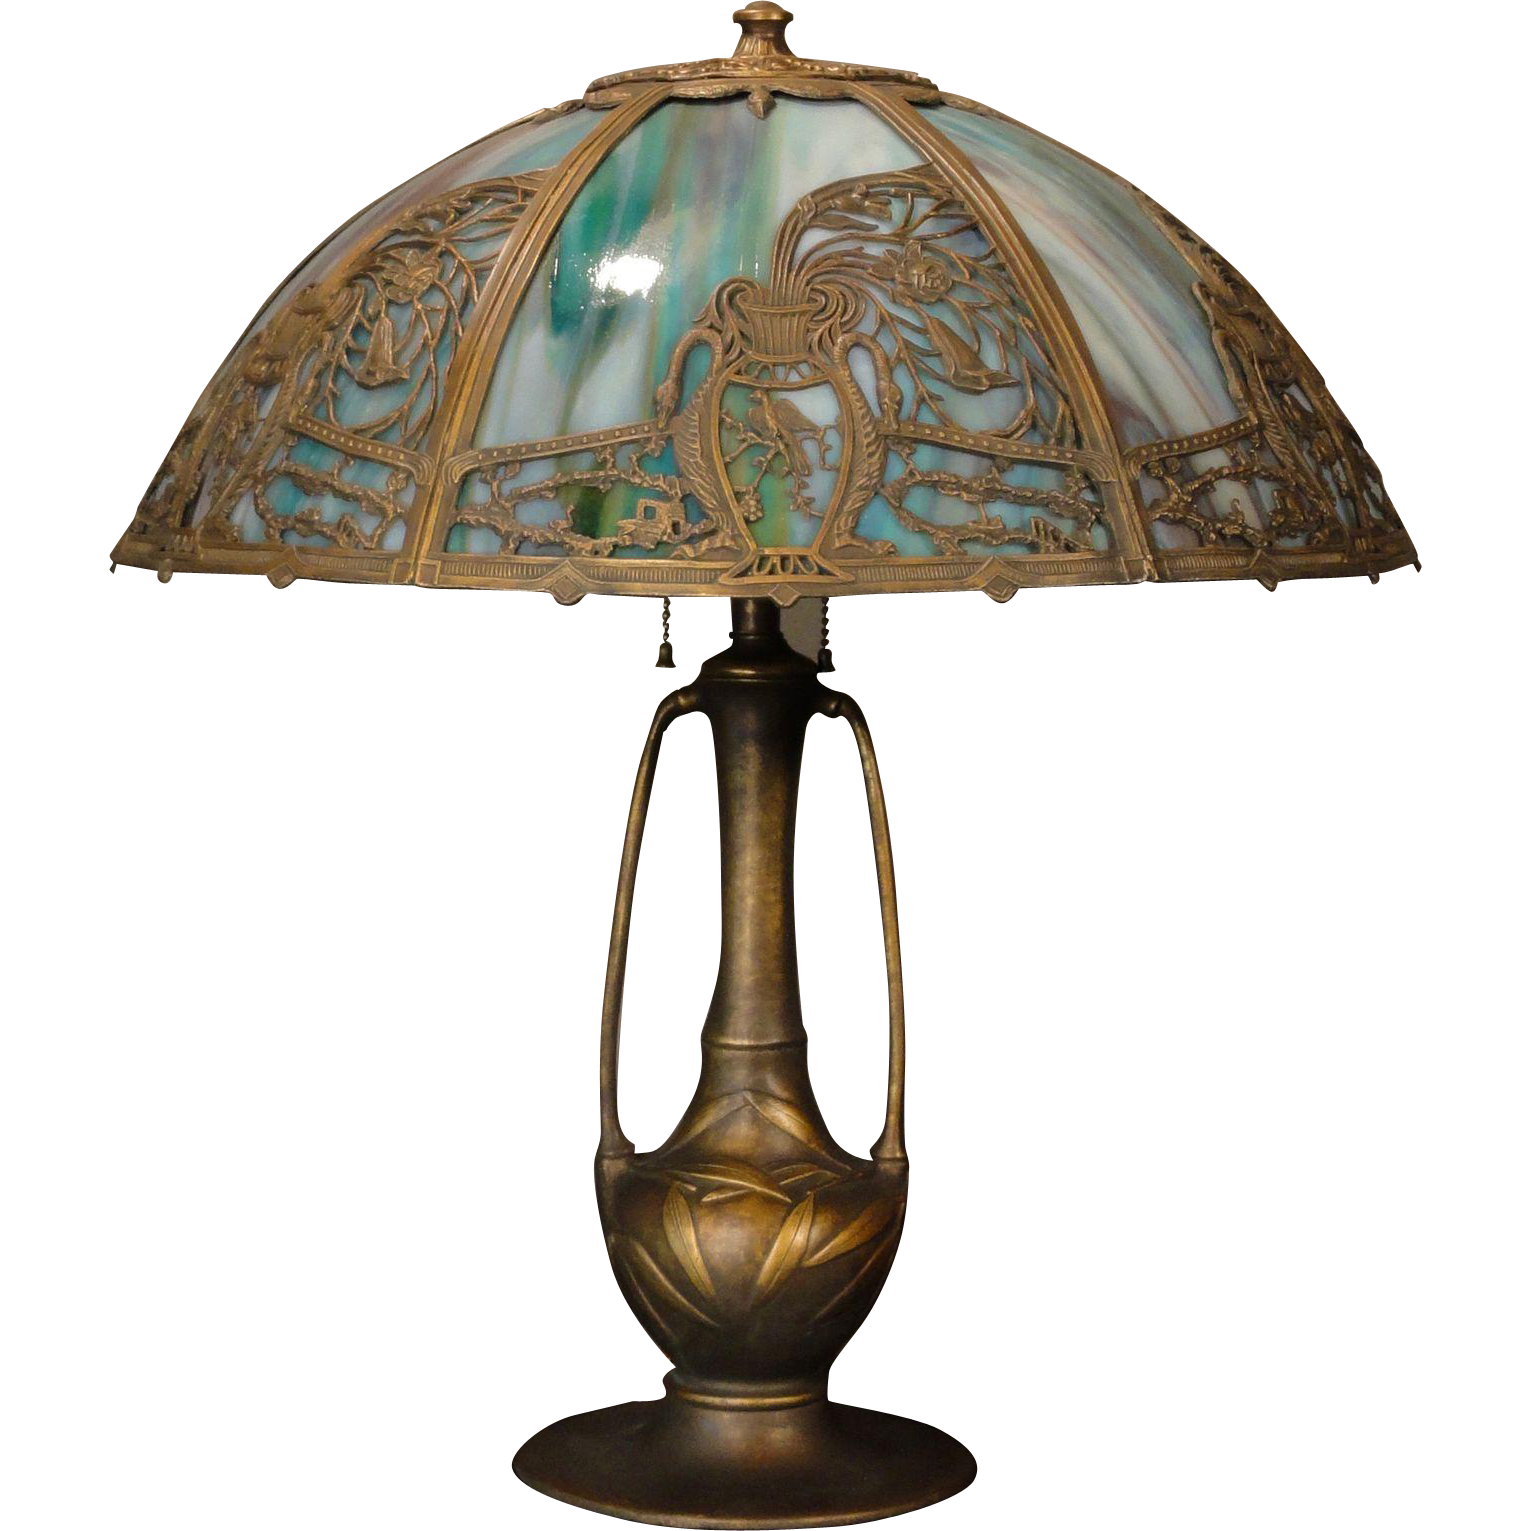 Large Stunning Art Nouveau Asymmetrical Vase & Flowers Slag Glass Lamp